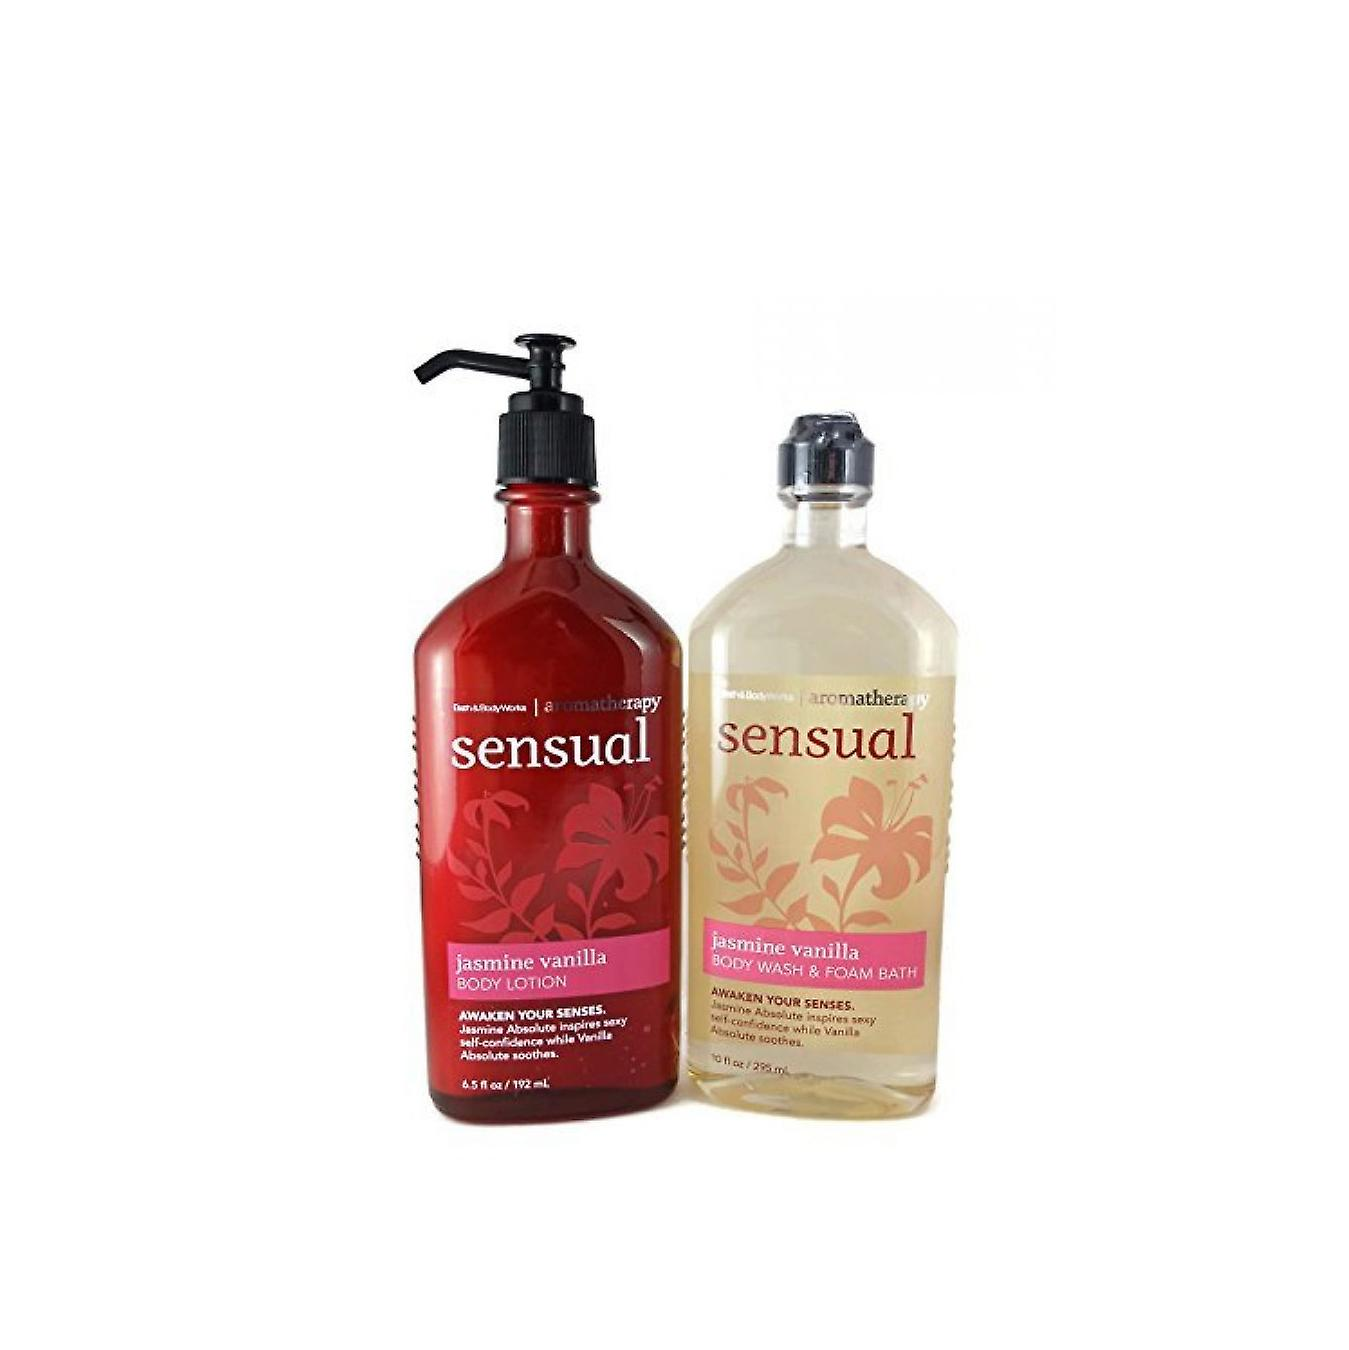 Bath & Body Works Aromatherapy Sensual Jasmine Vanilla Gift Set